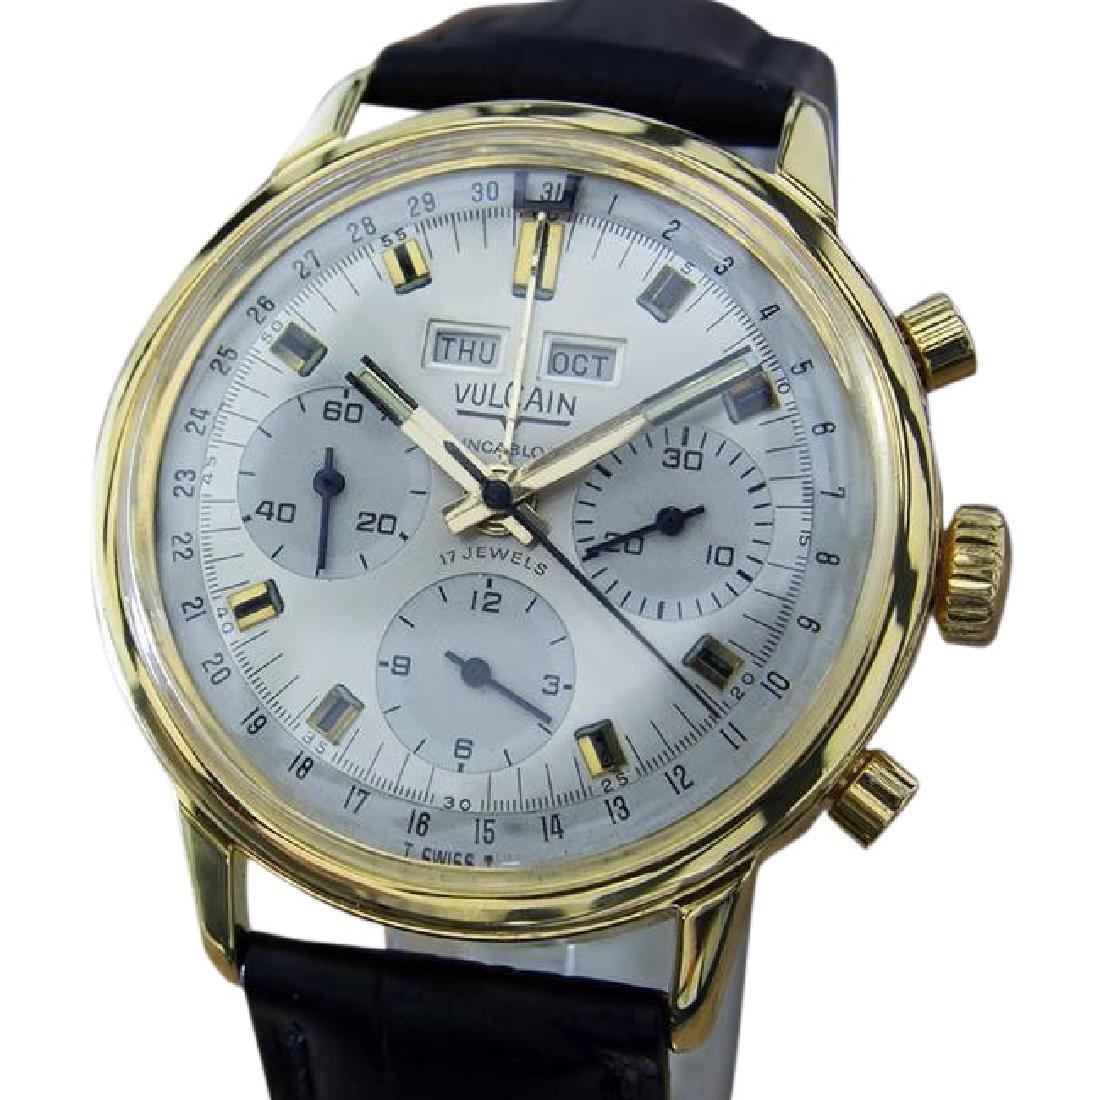 Vulcain Swiss Triple Calendar Chronograph Watch